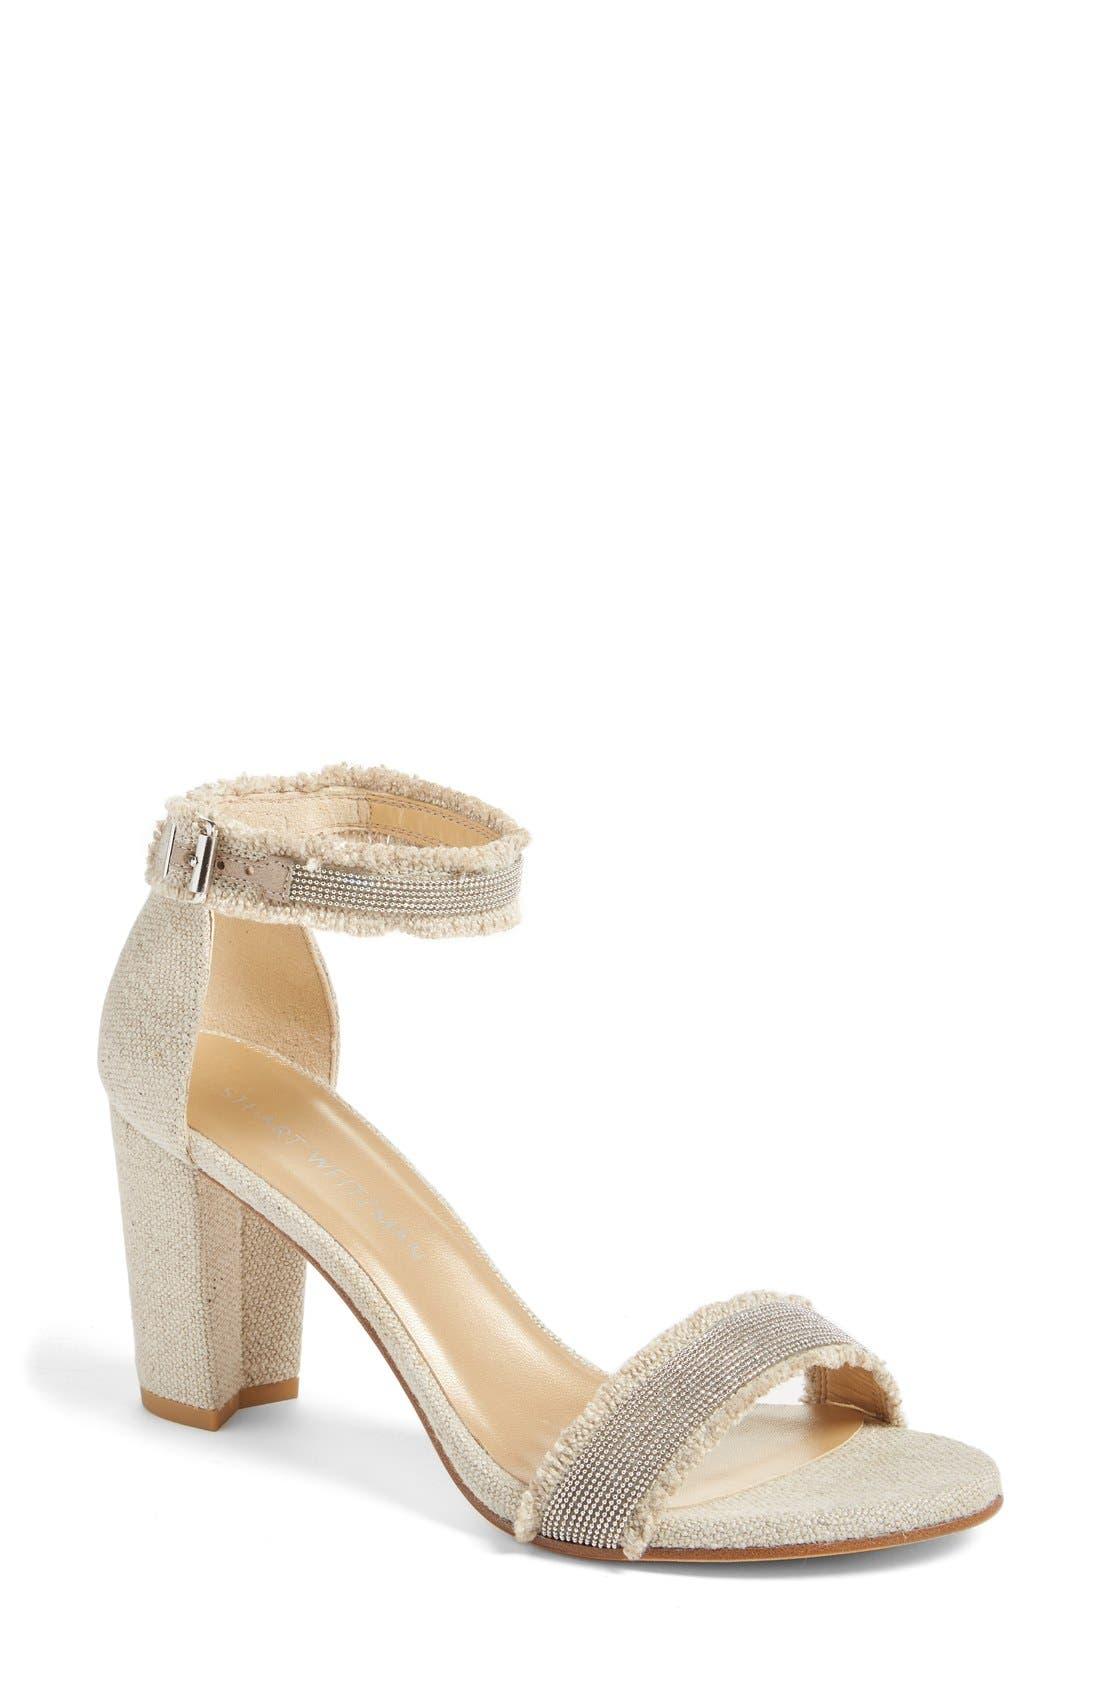 Alternate Image 1 Selected - Stuart Weitzman 'Chaingang' Ankle Strap Sandal (Women)